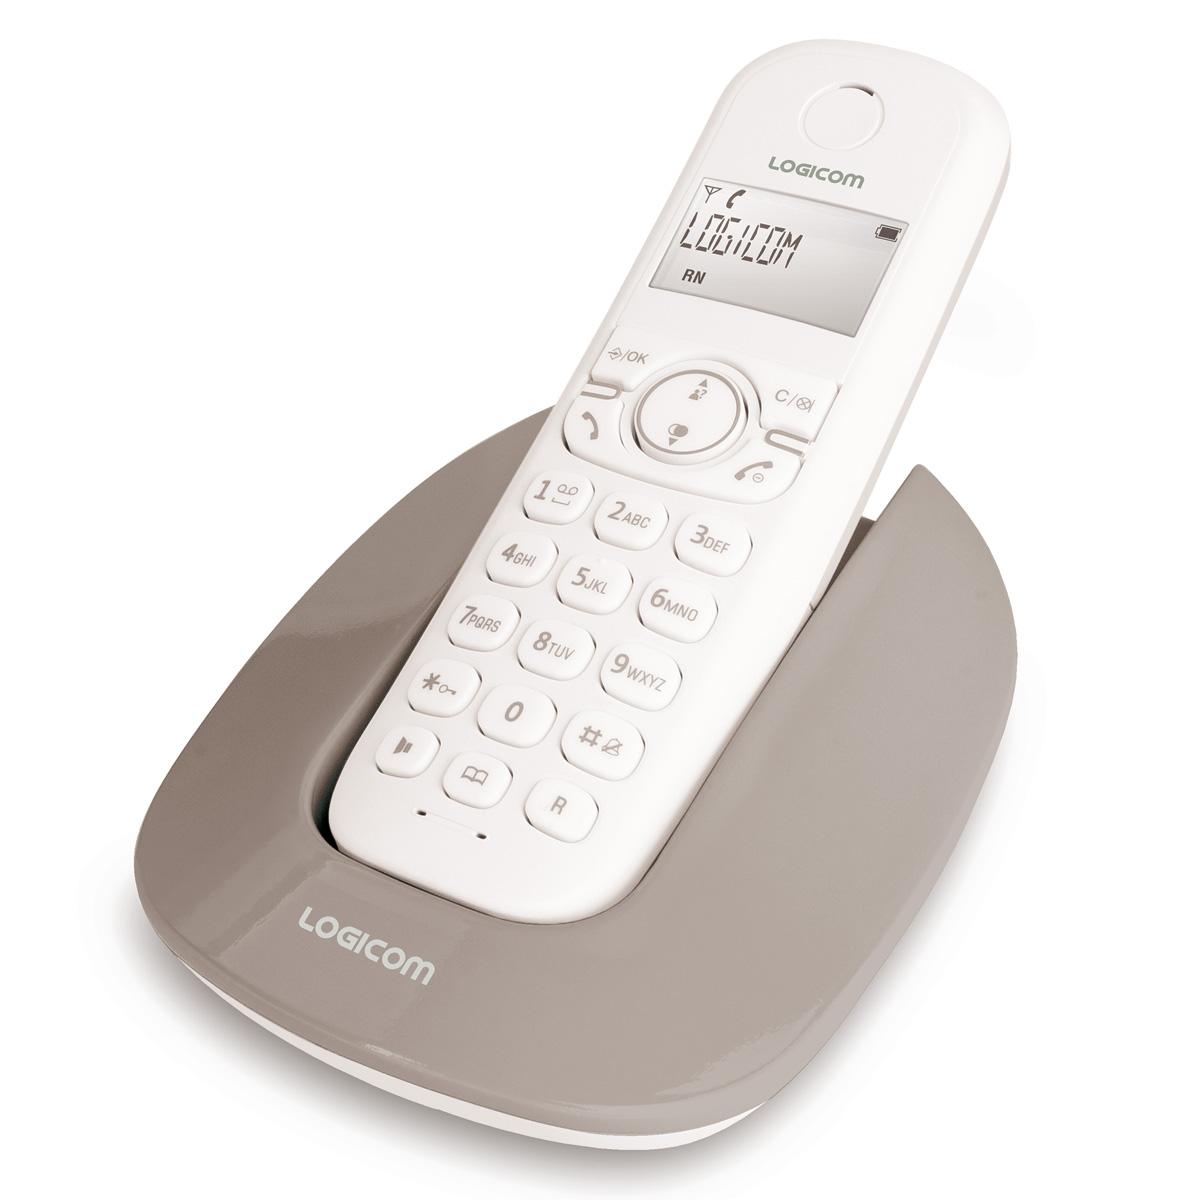 logicom manta 150 taupe manta 150 taupe achat vente t l phone sans fil sur. Black Bedroom Furniture Sets. Home Design Ideas